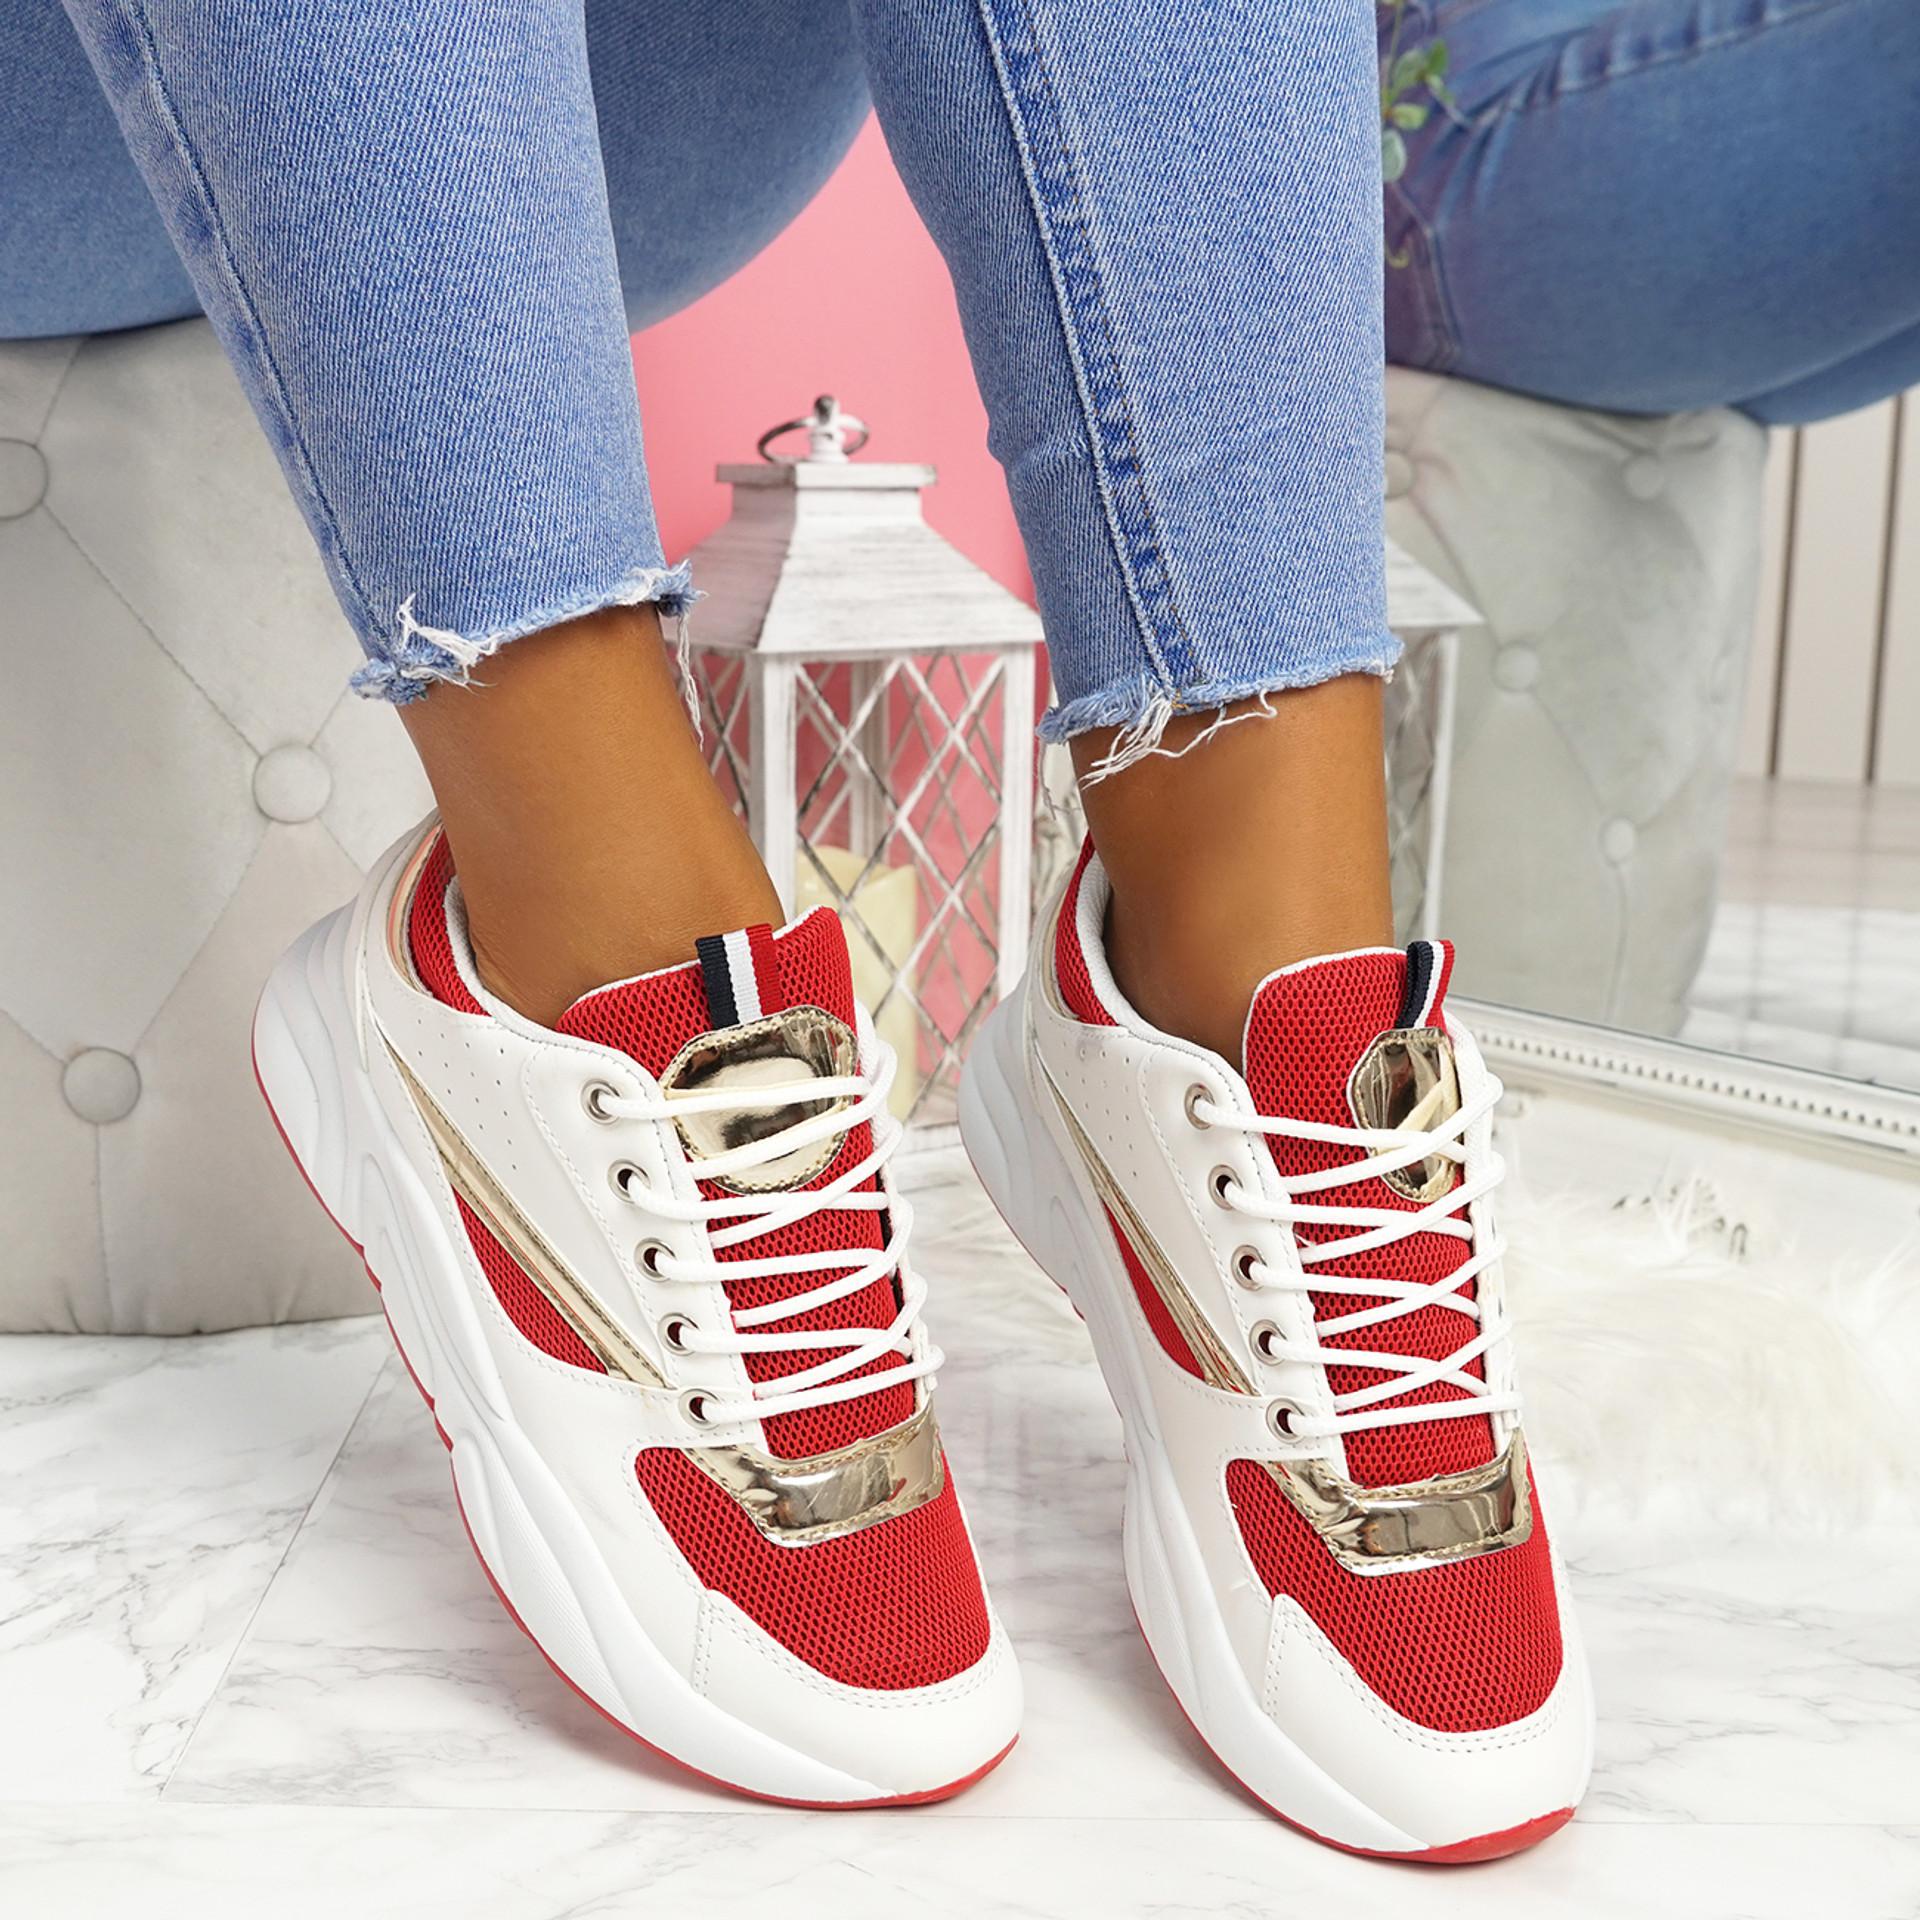 Kitta Red Chunky Sneakers